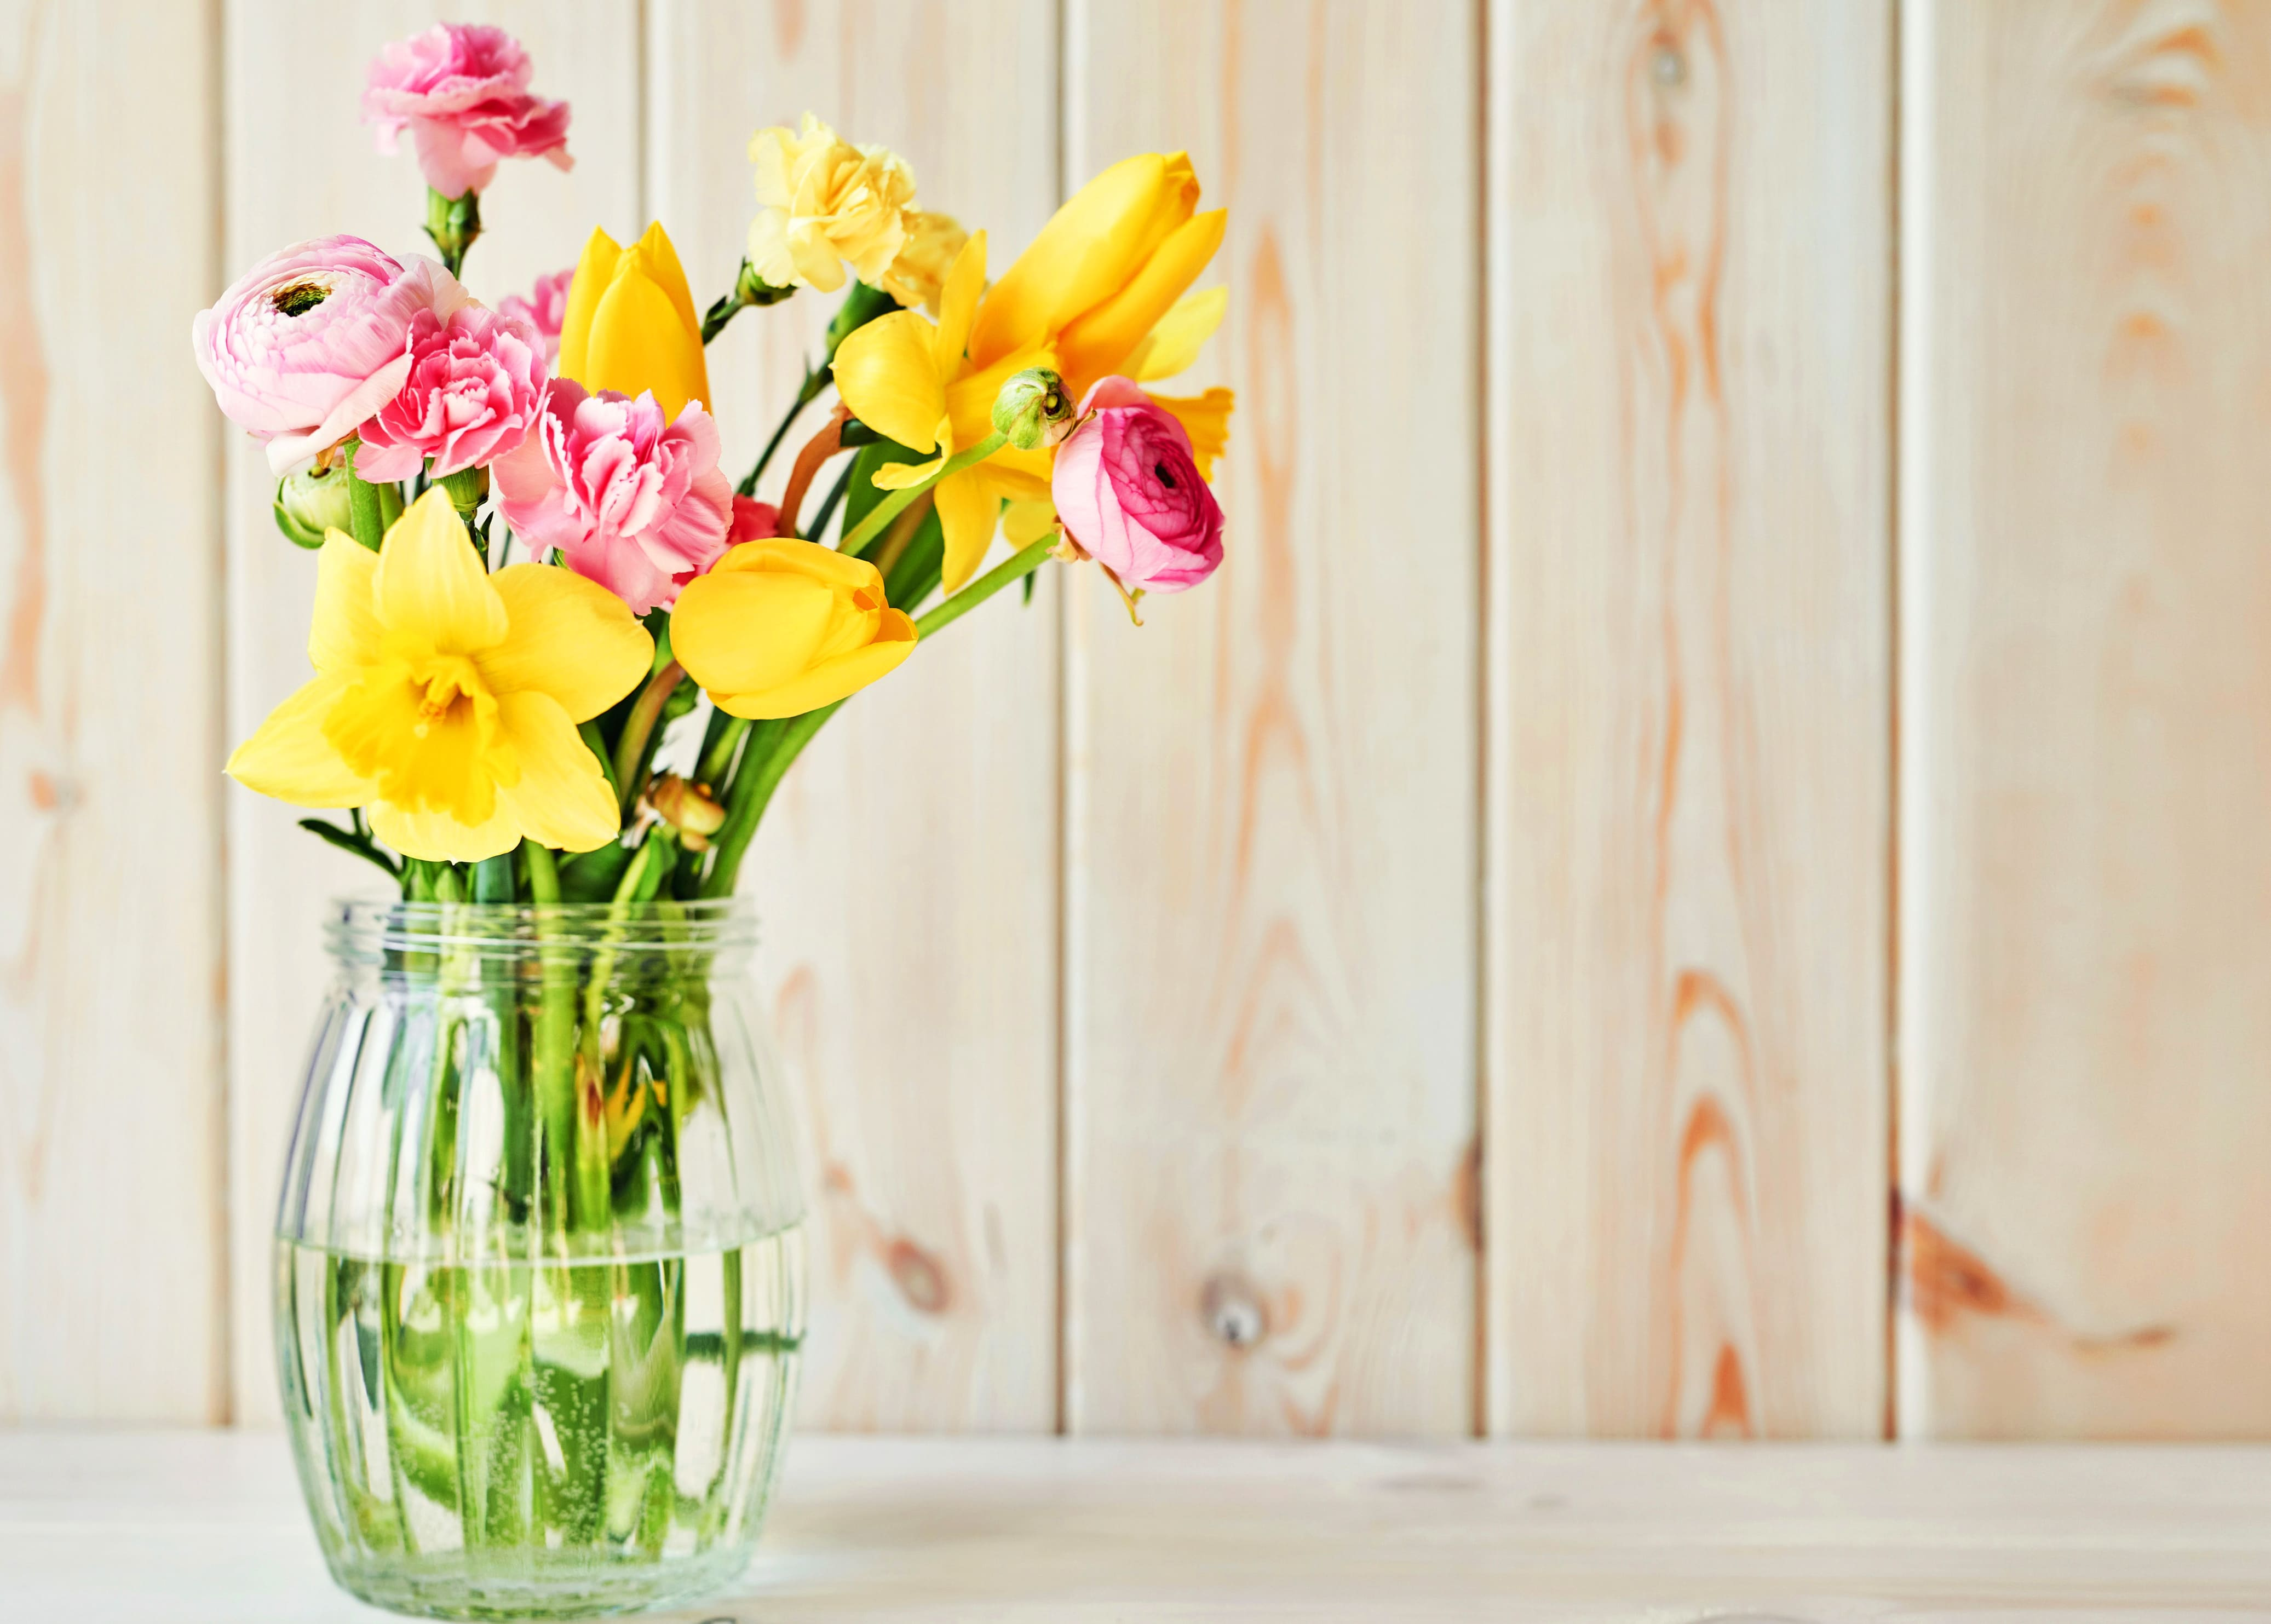 daffodils-photo-28